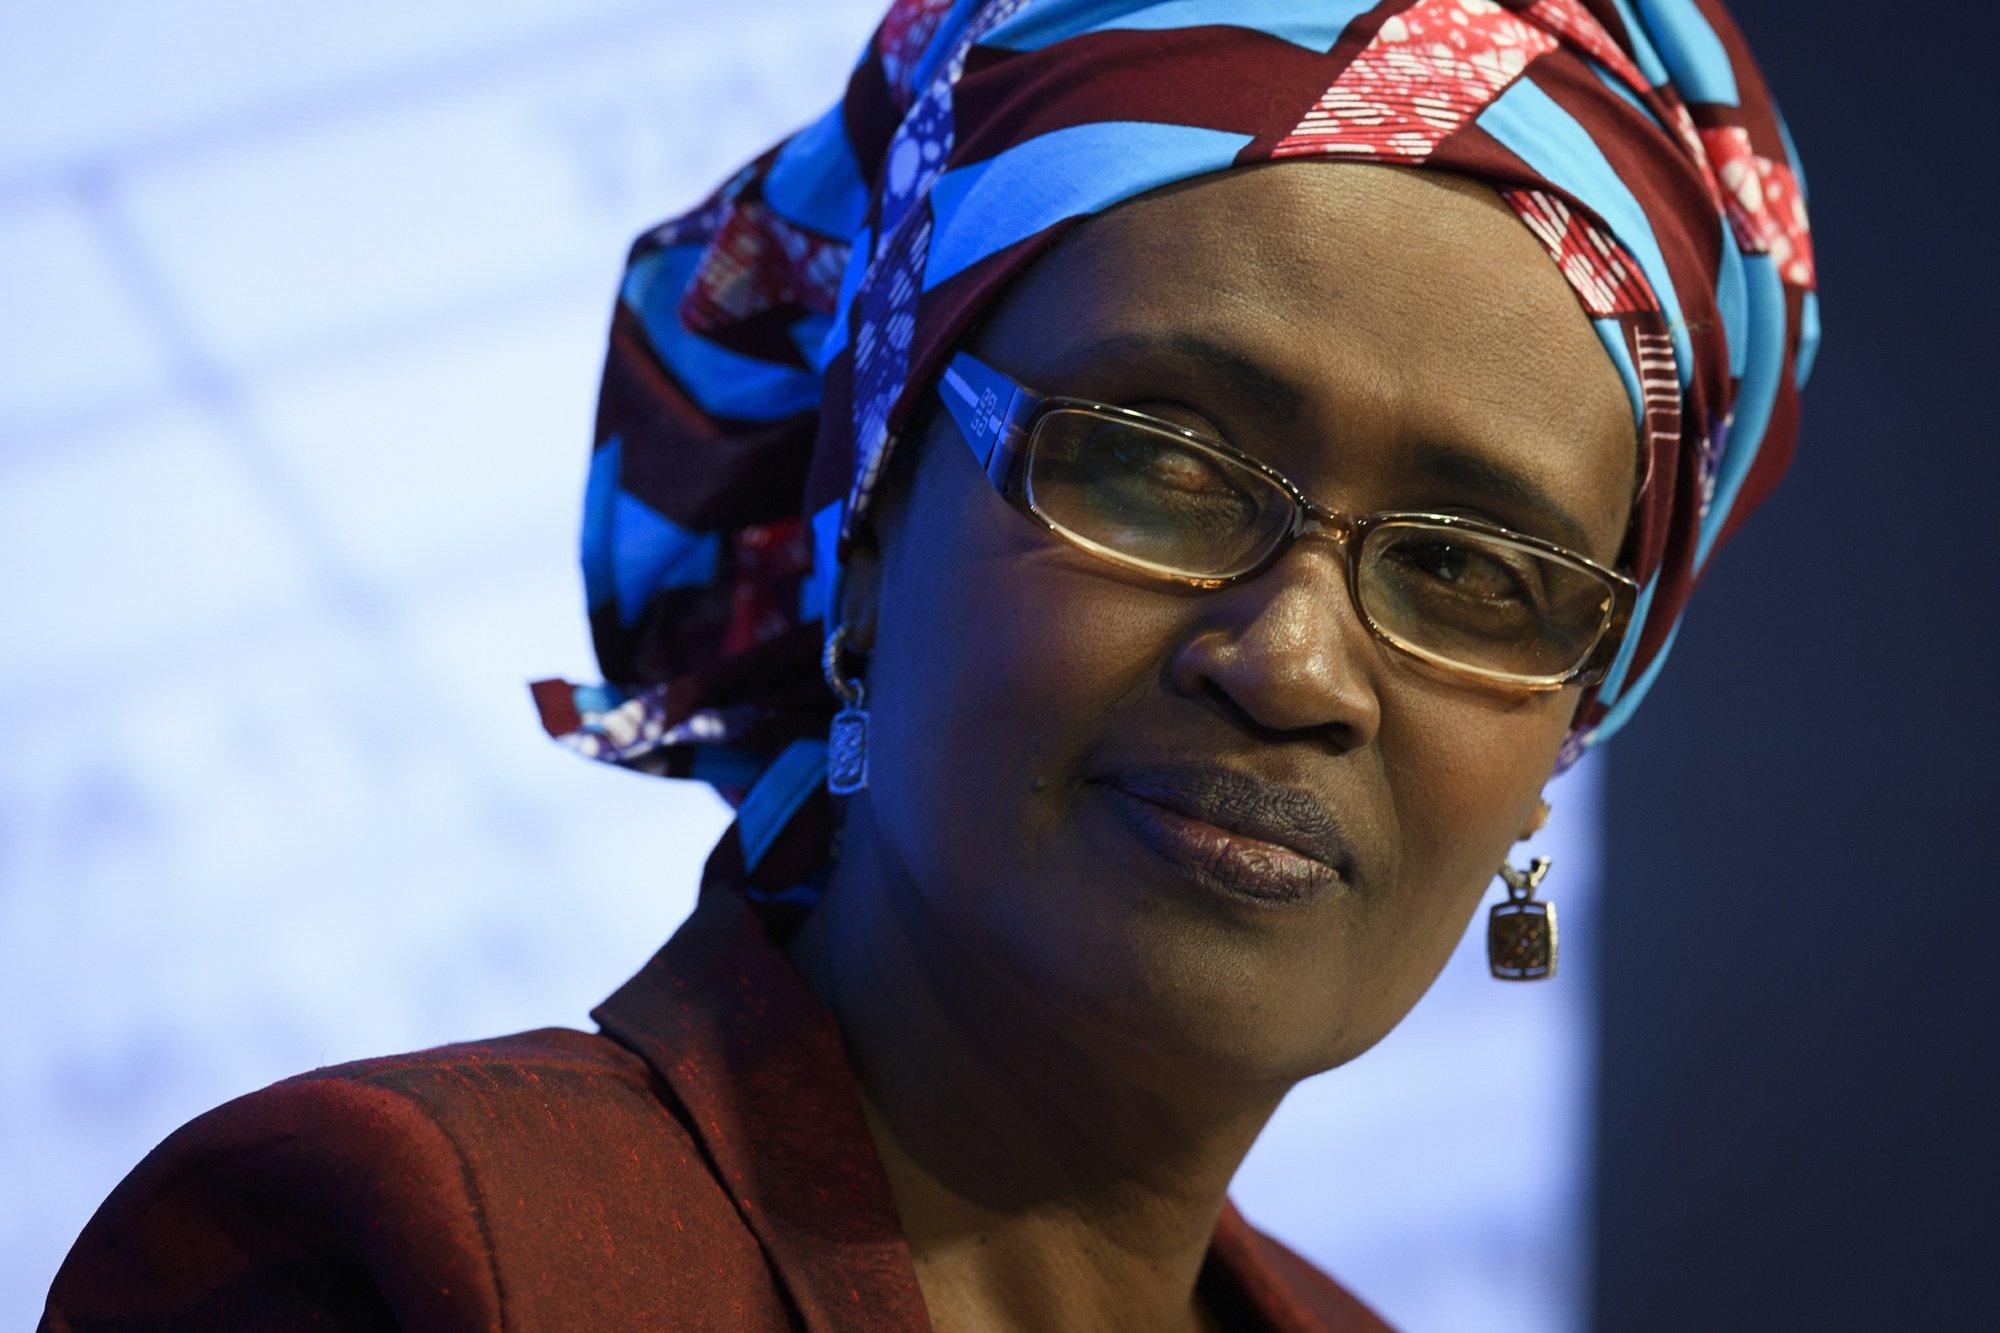 Humanitarian activist Winnie Byanyima named to head UNAIDS